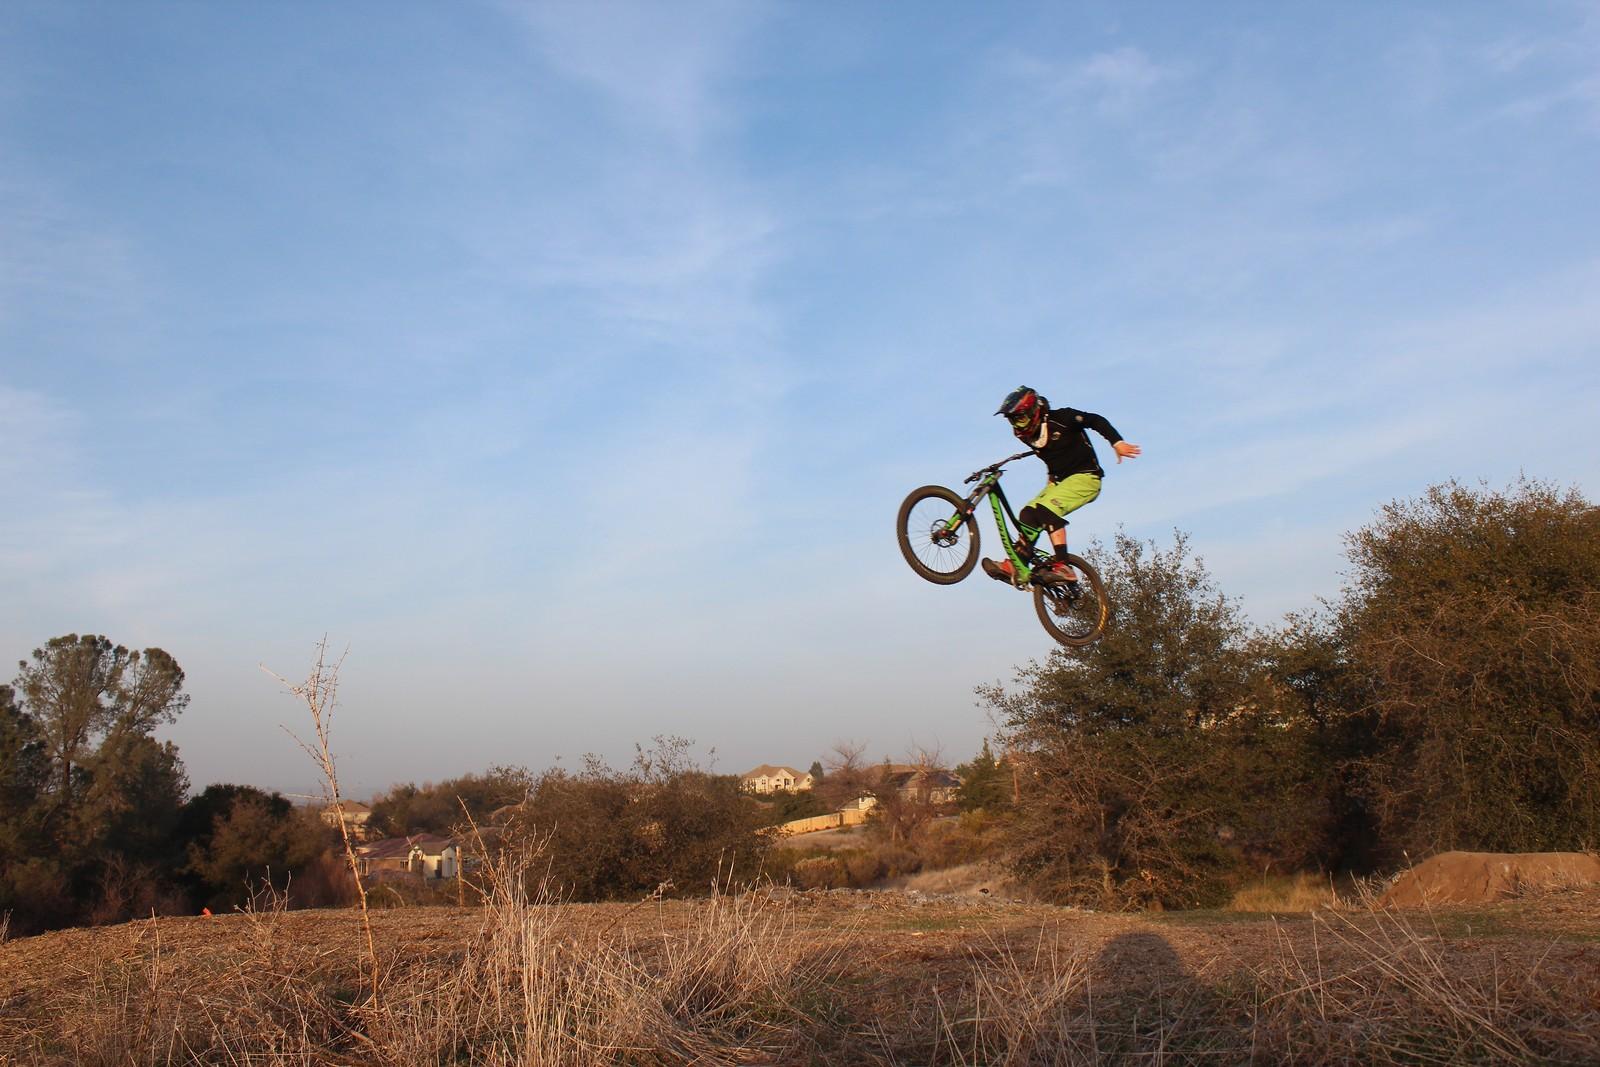 Suicide - Scharney127 - Mountain Biking Pictures - Vital MTB